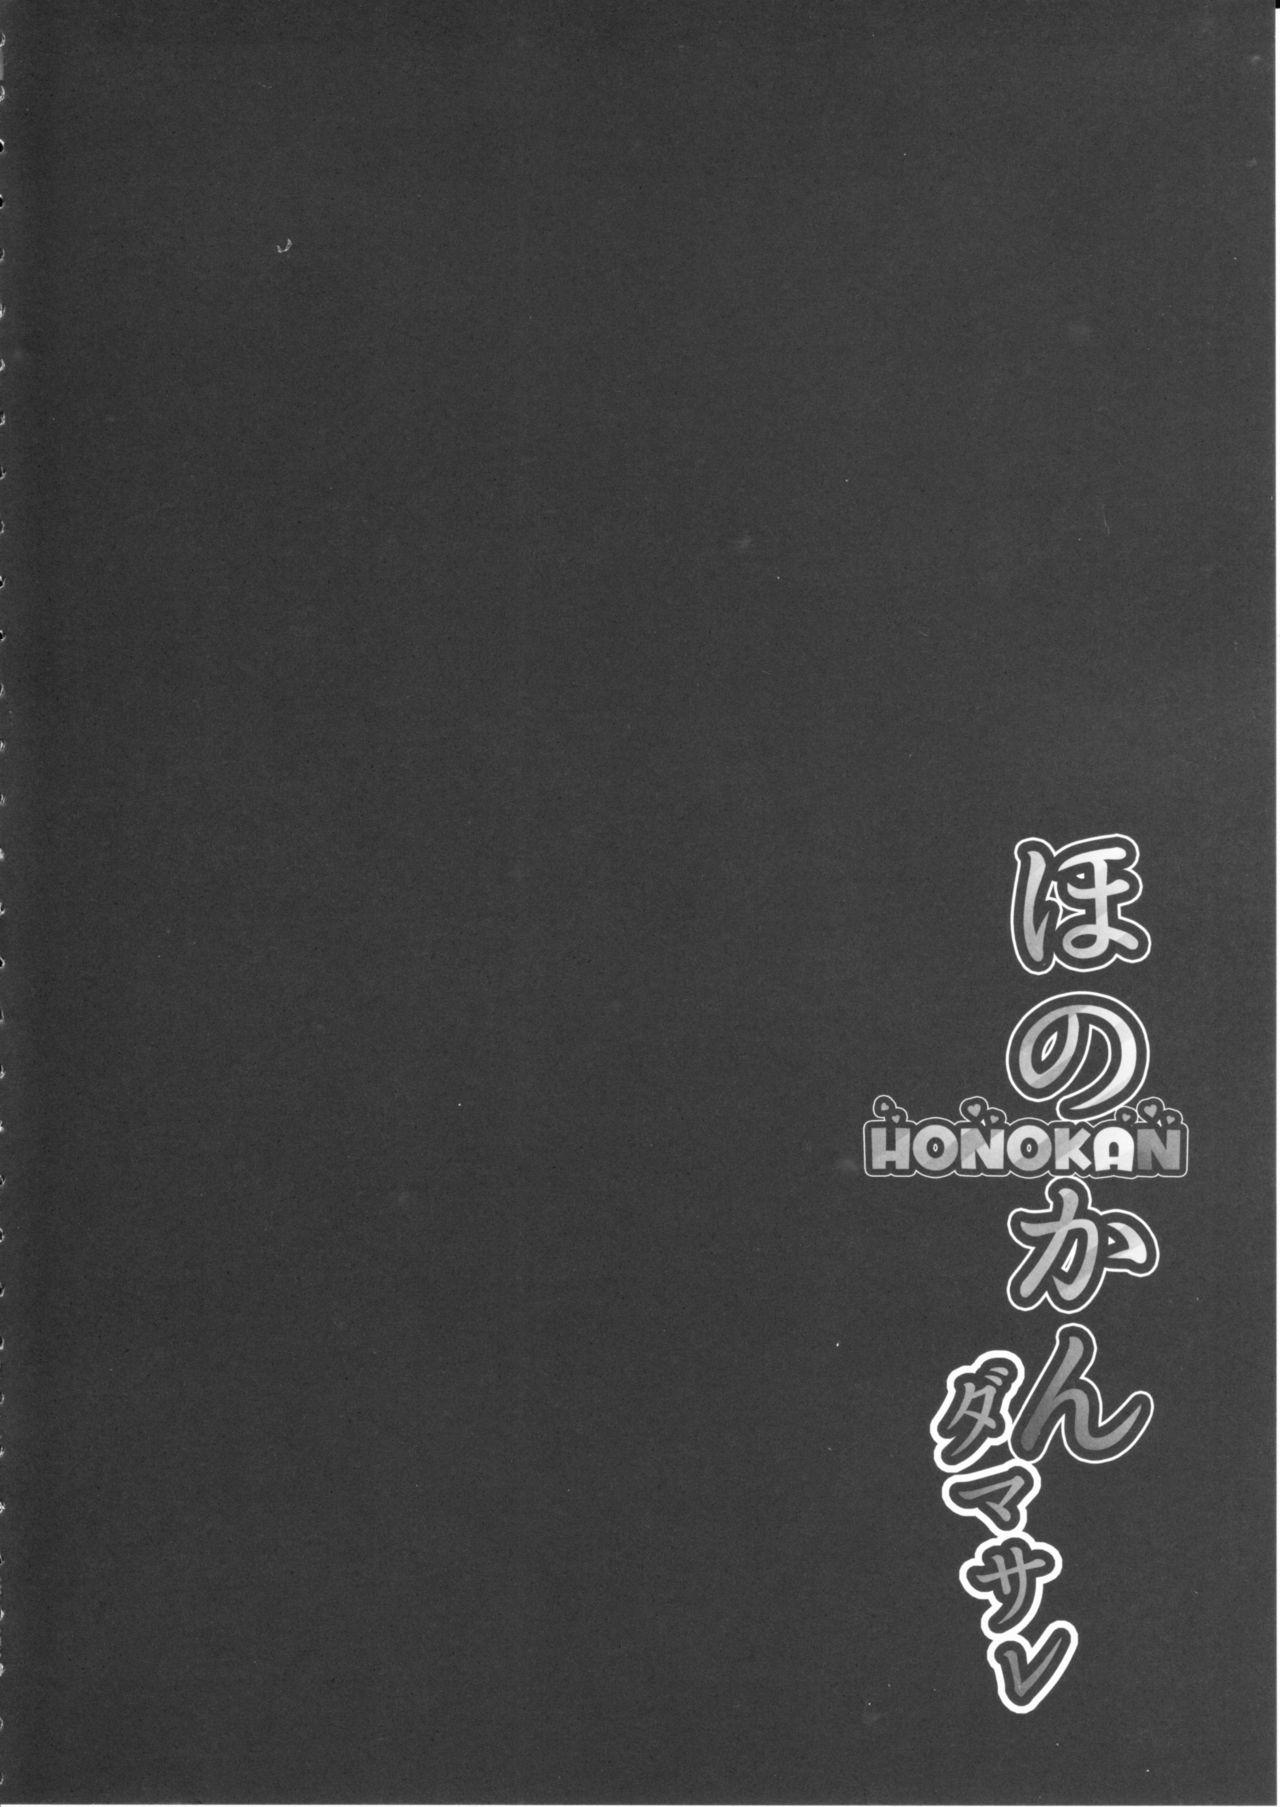 (C90) [corori (Yopparai Oni?)] HONOKAN ~ Damasare ~ Dokonimo nige rarenai ~! (Love Live!) 6